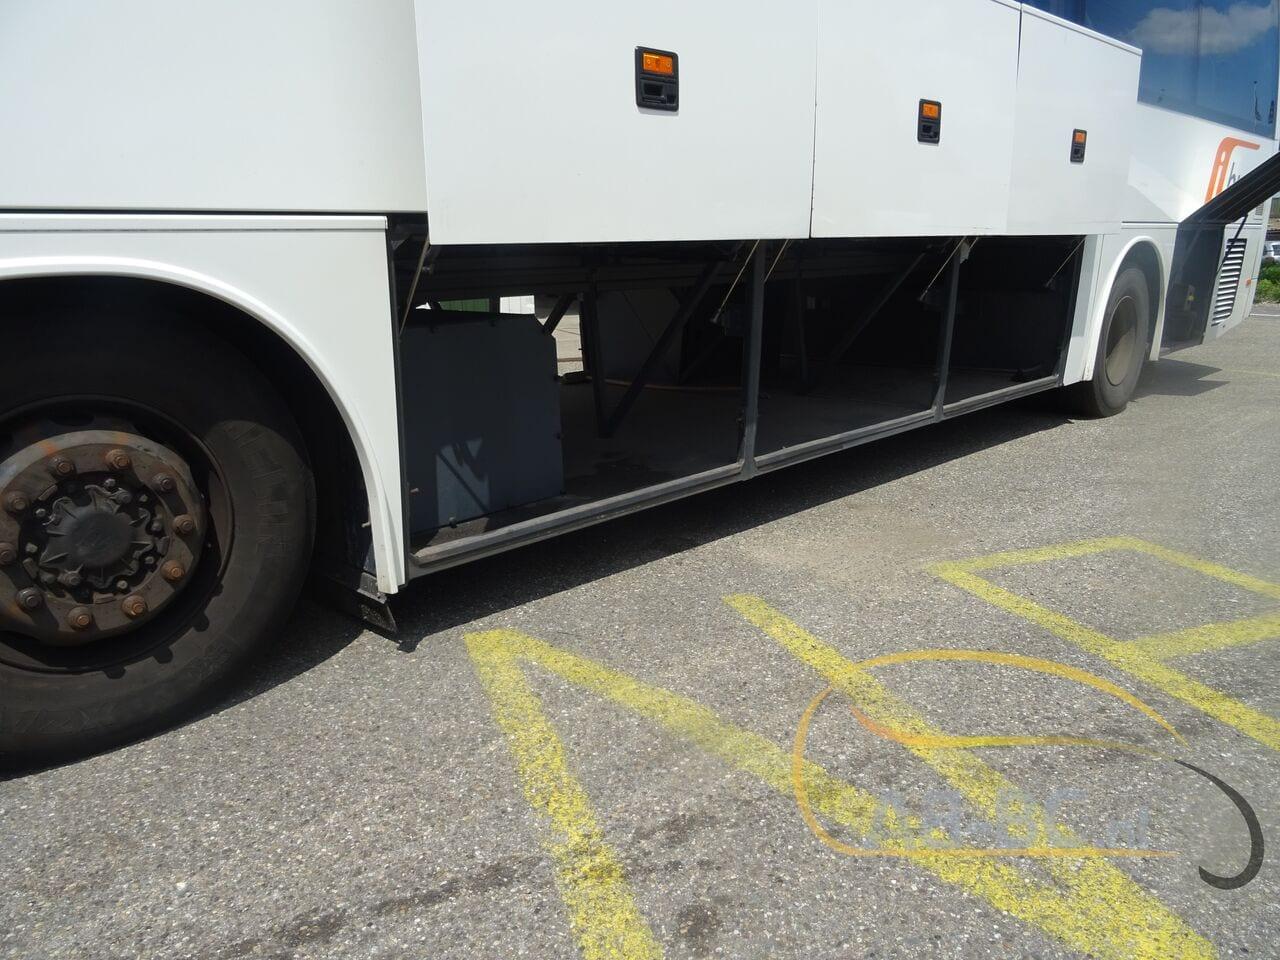 coach-busTEMSA-Safari-RD-DAF-Motor-53-Seats-Euro-5---1623932648484523308_big_3021c48632d3ffb27c1d07b616badc22--21061715155620919600